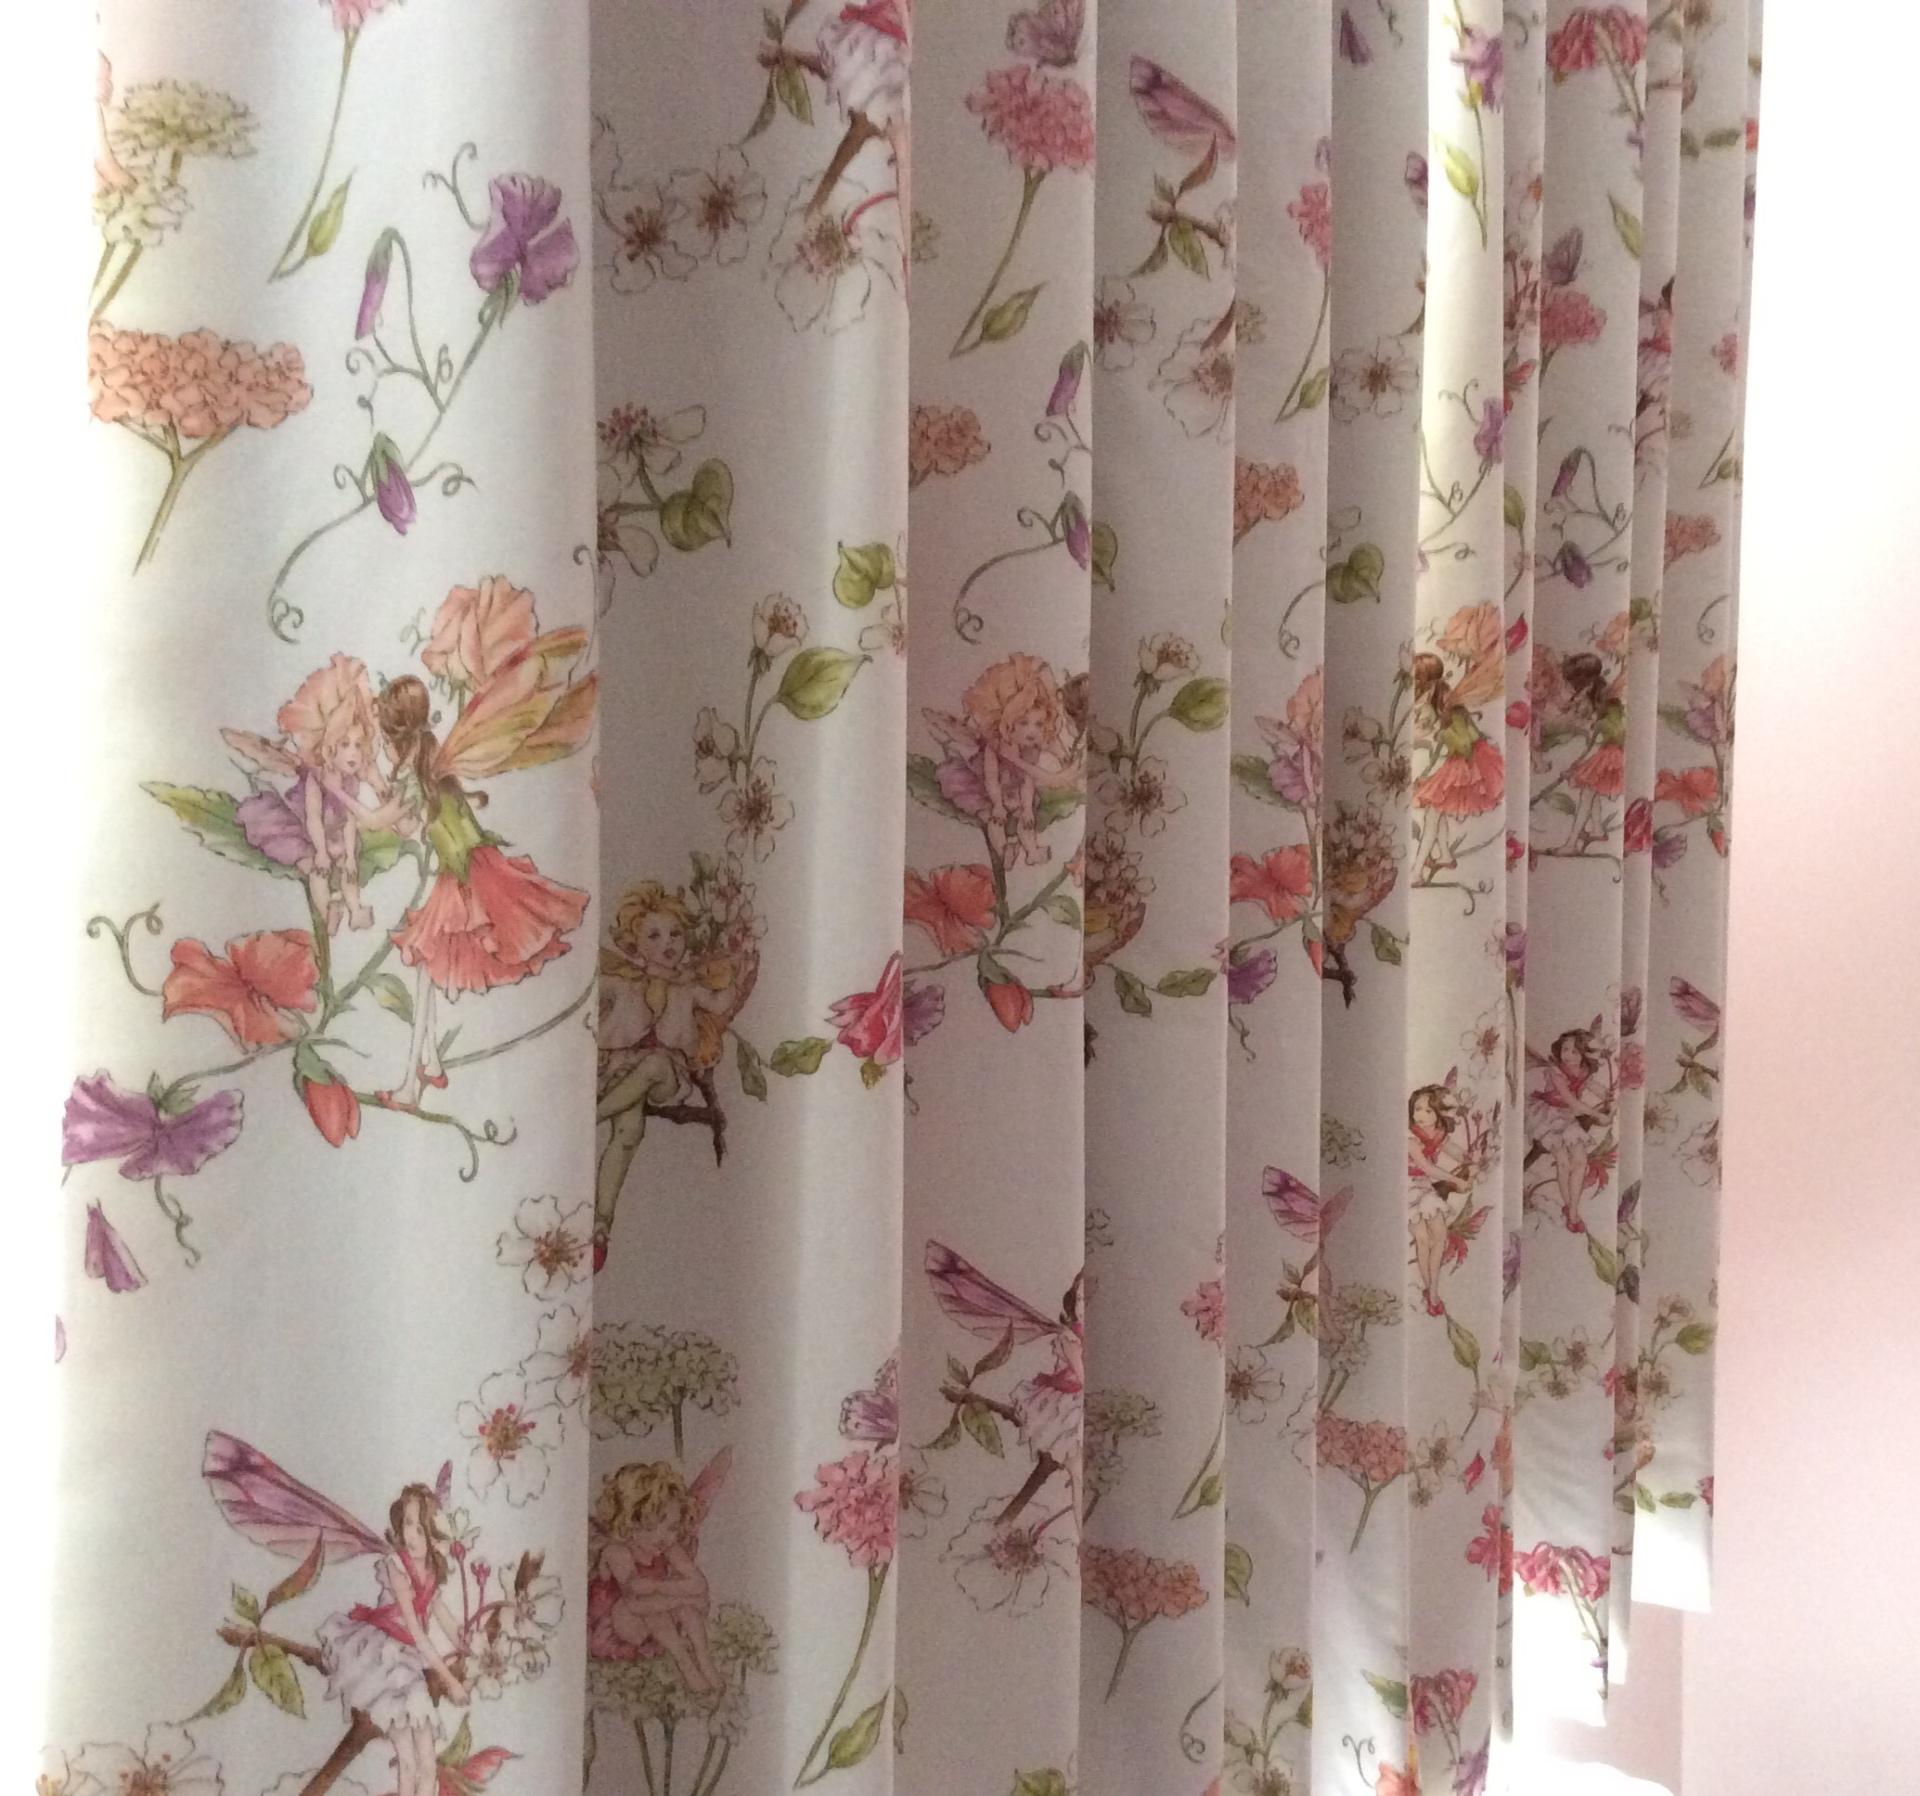 Hand-sewn Curtains in Hampton